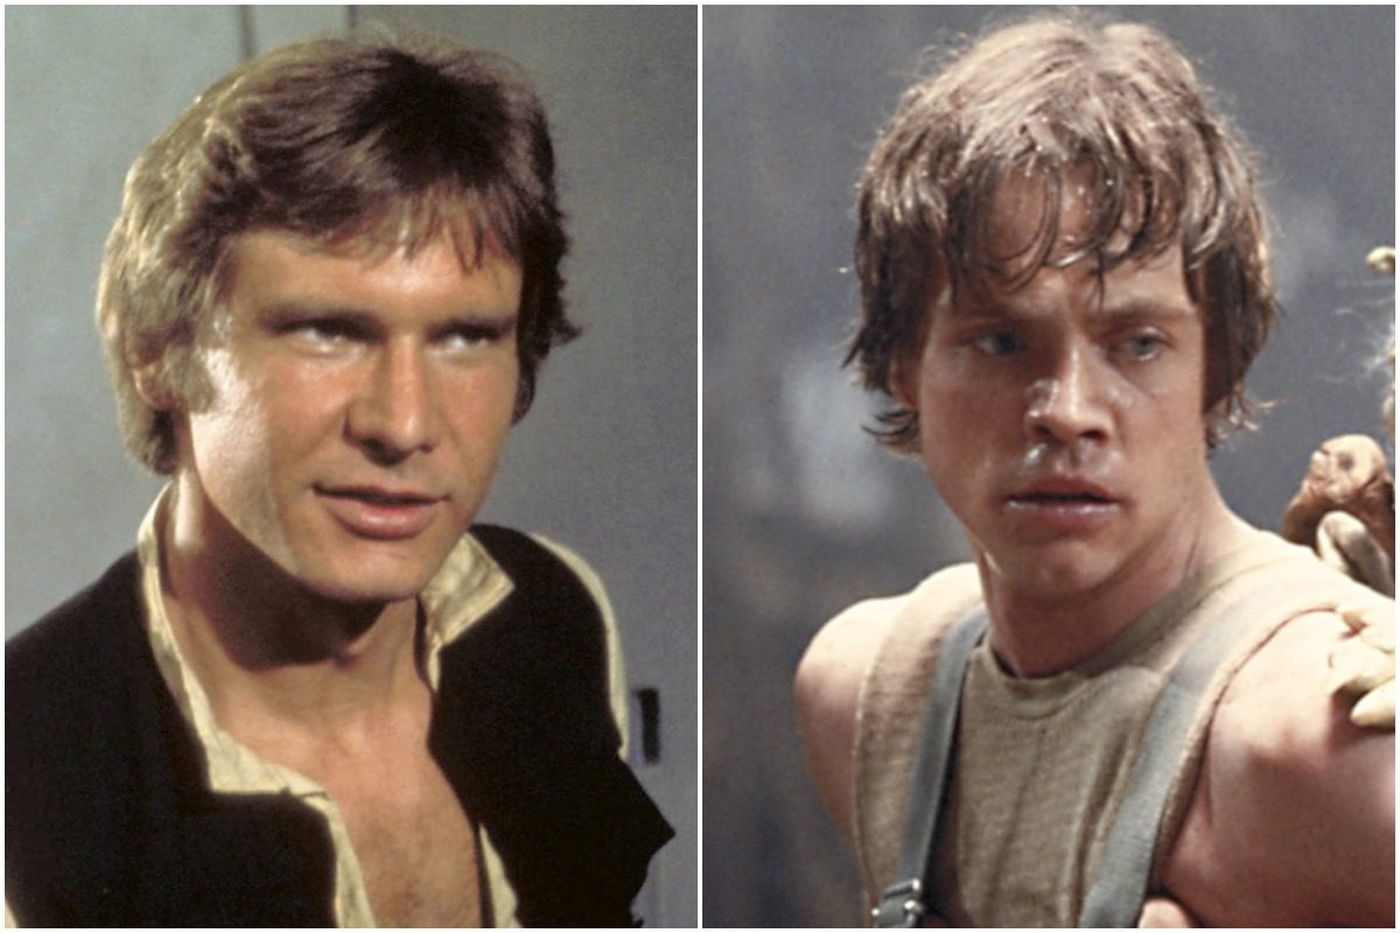 han solo or luke skywalker? this 'star wars' fan made his choice a